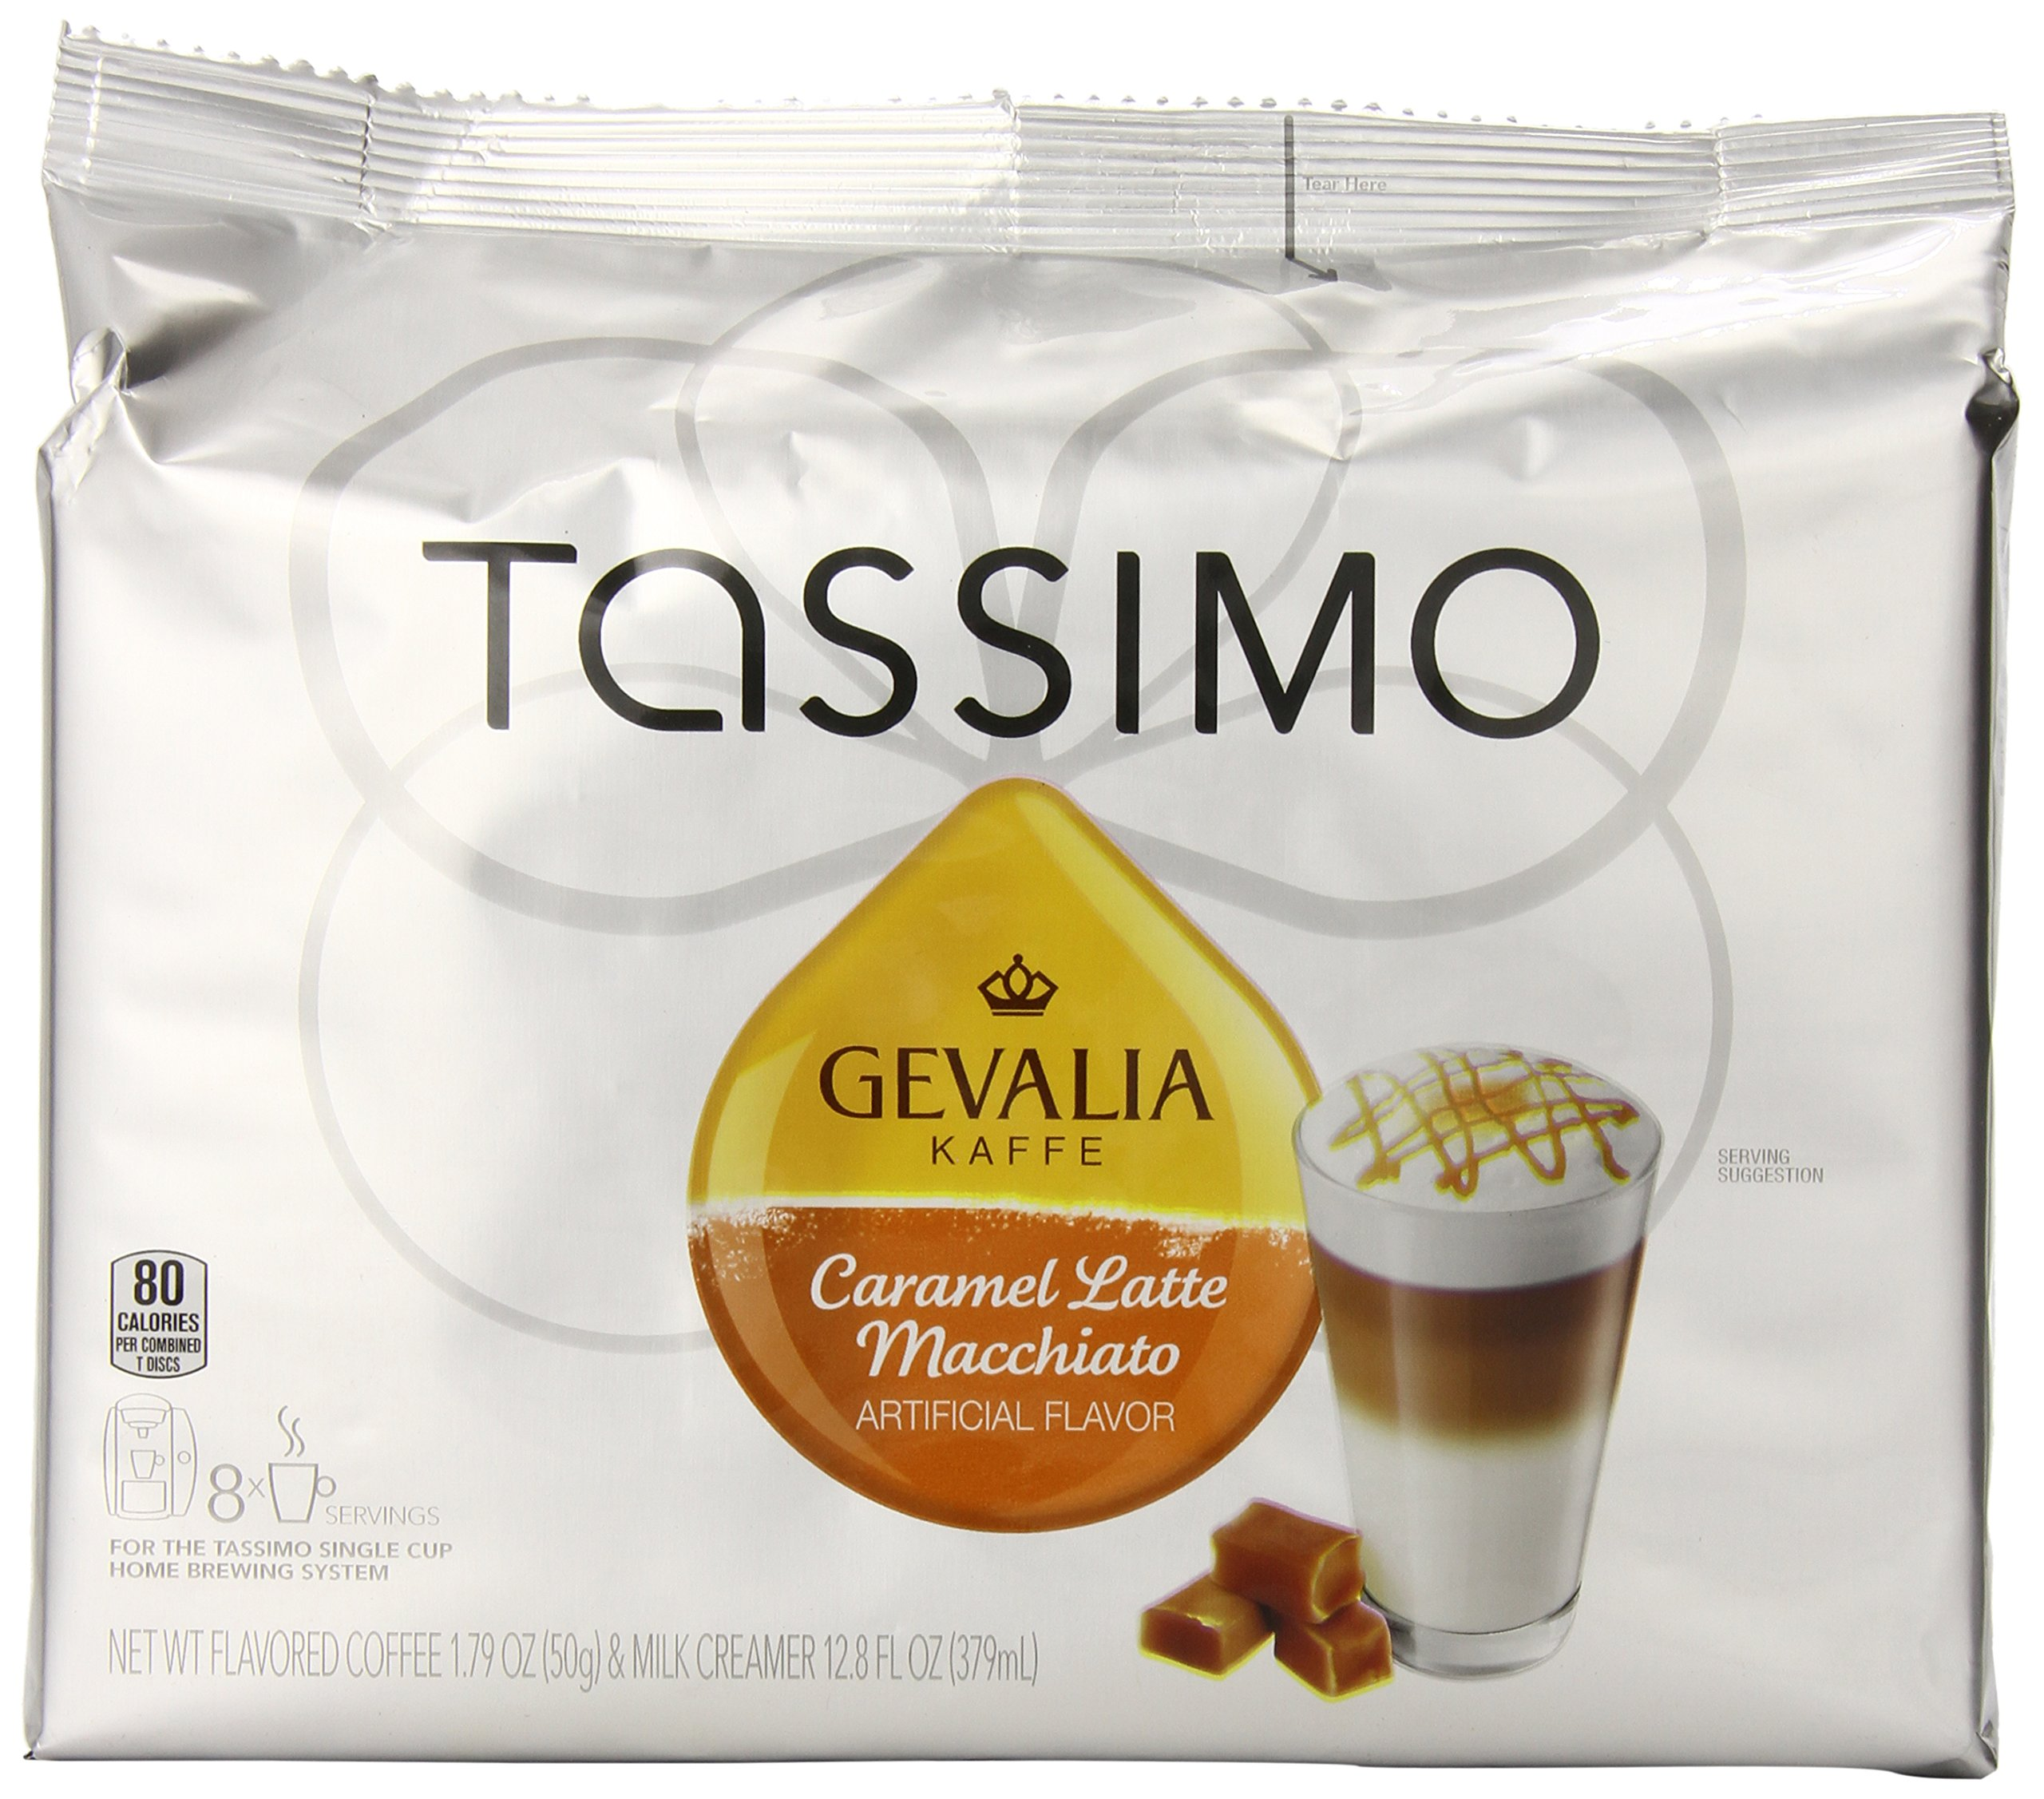 Gevalia Caramel Latte Macchiato Coffee, T-Discs for Tassimo Brewing Systems, 8 Count